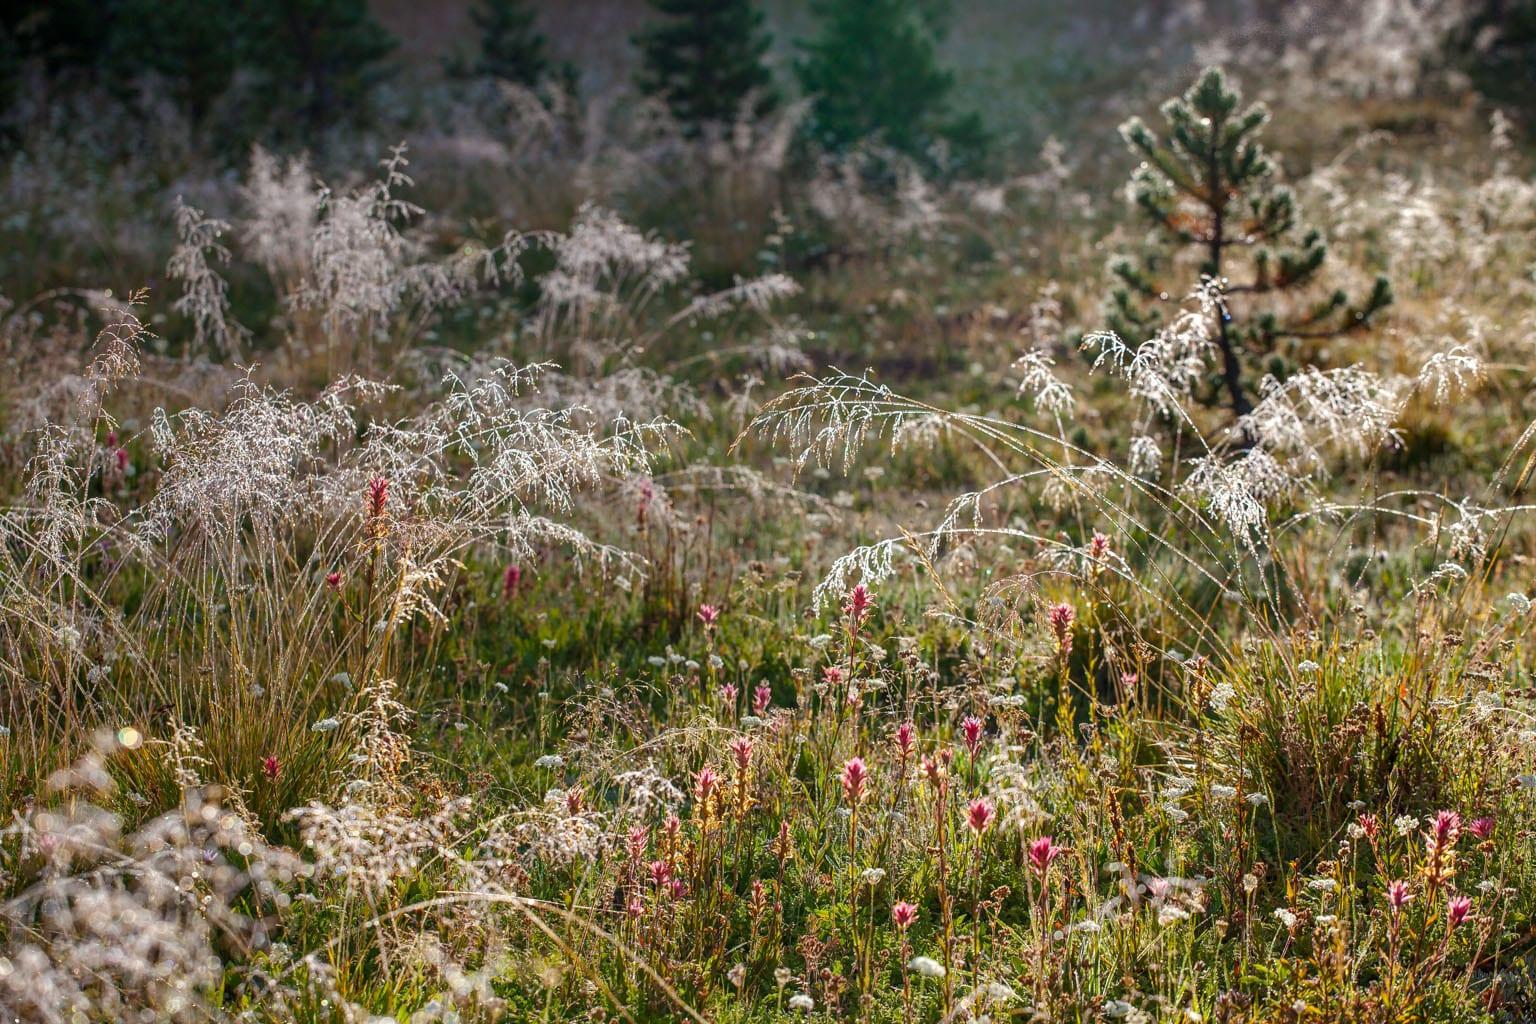 Deschampsia cespitosa, tufted hairgrass California native plant Sierra meadow with Castilleja miniata - Great Red Paintbrush.